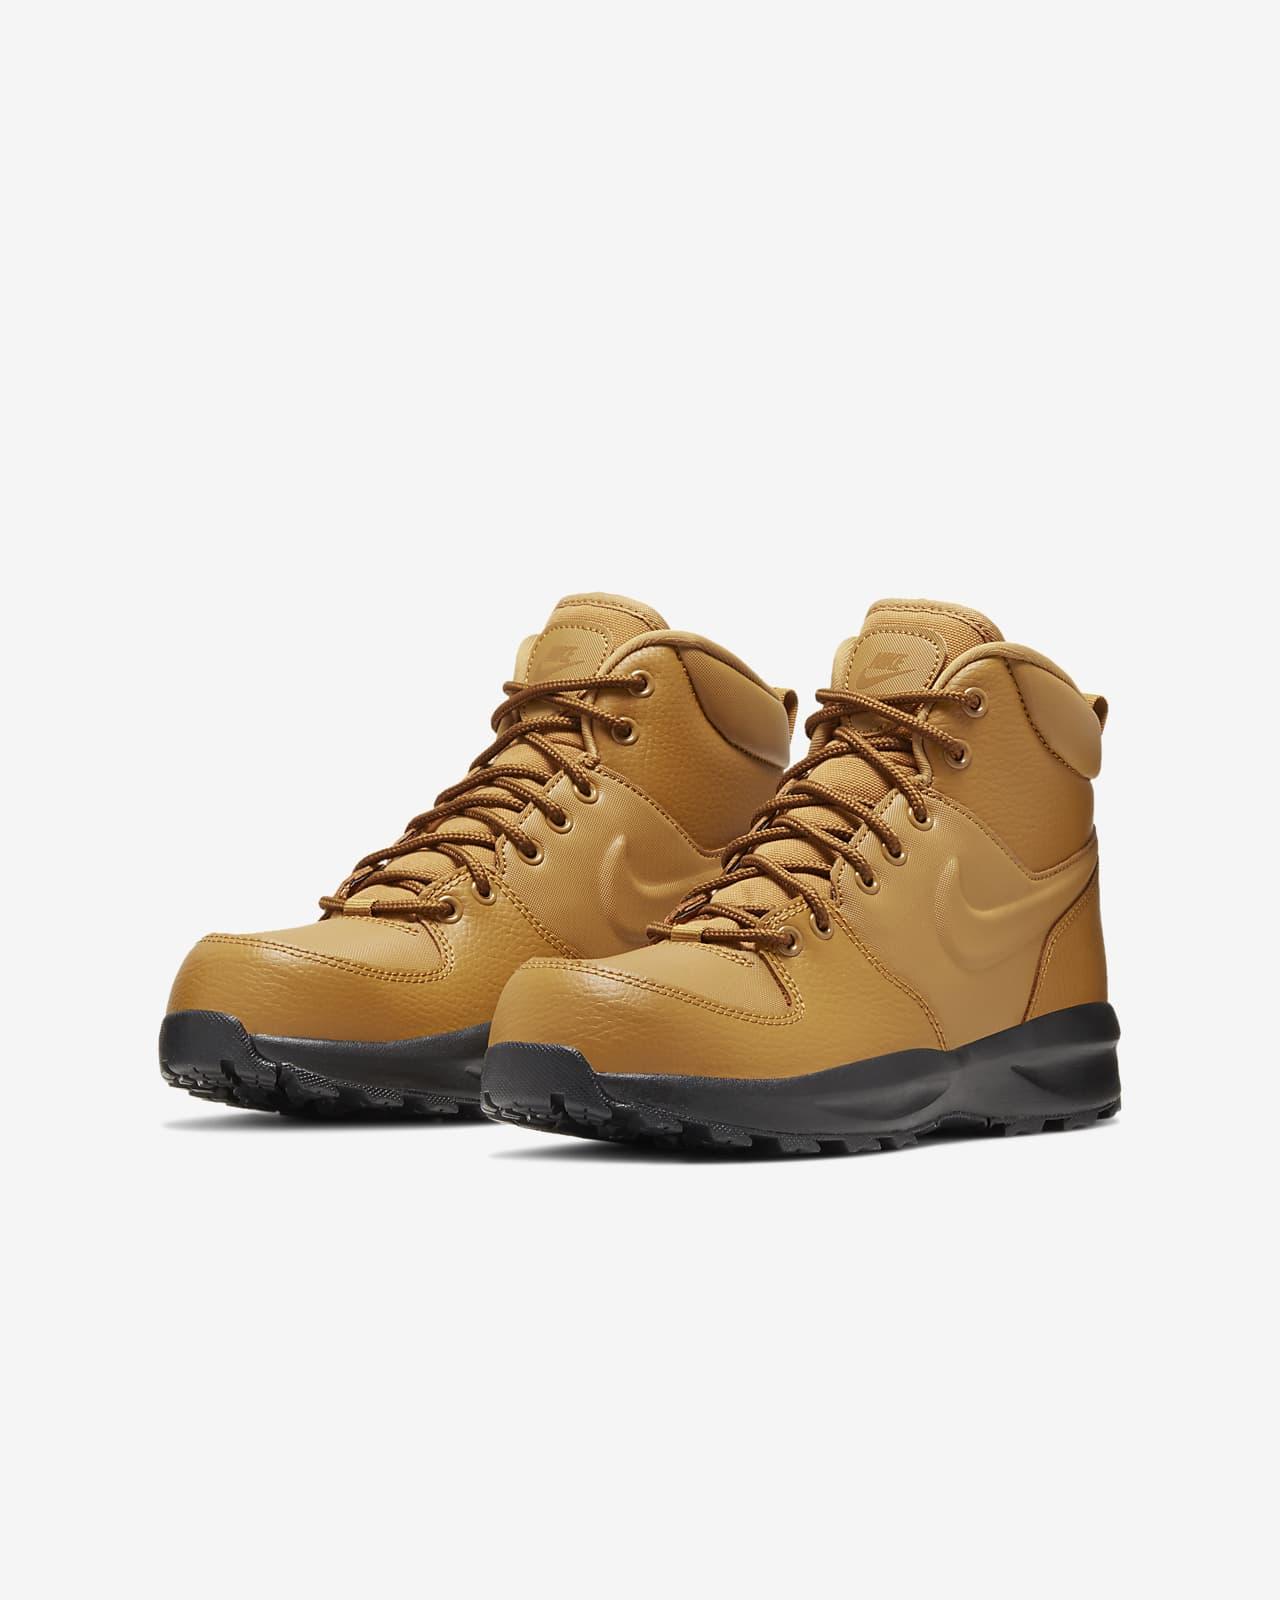 Nike Manoa LTR Older Kids' Boot. Nike MA